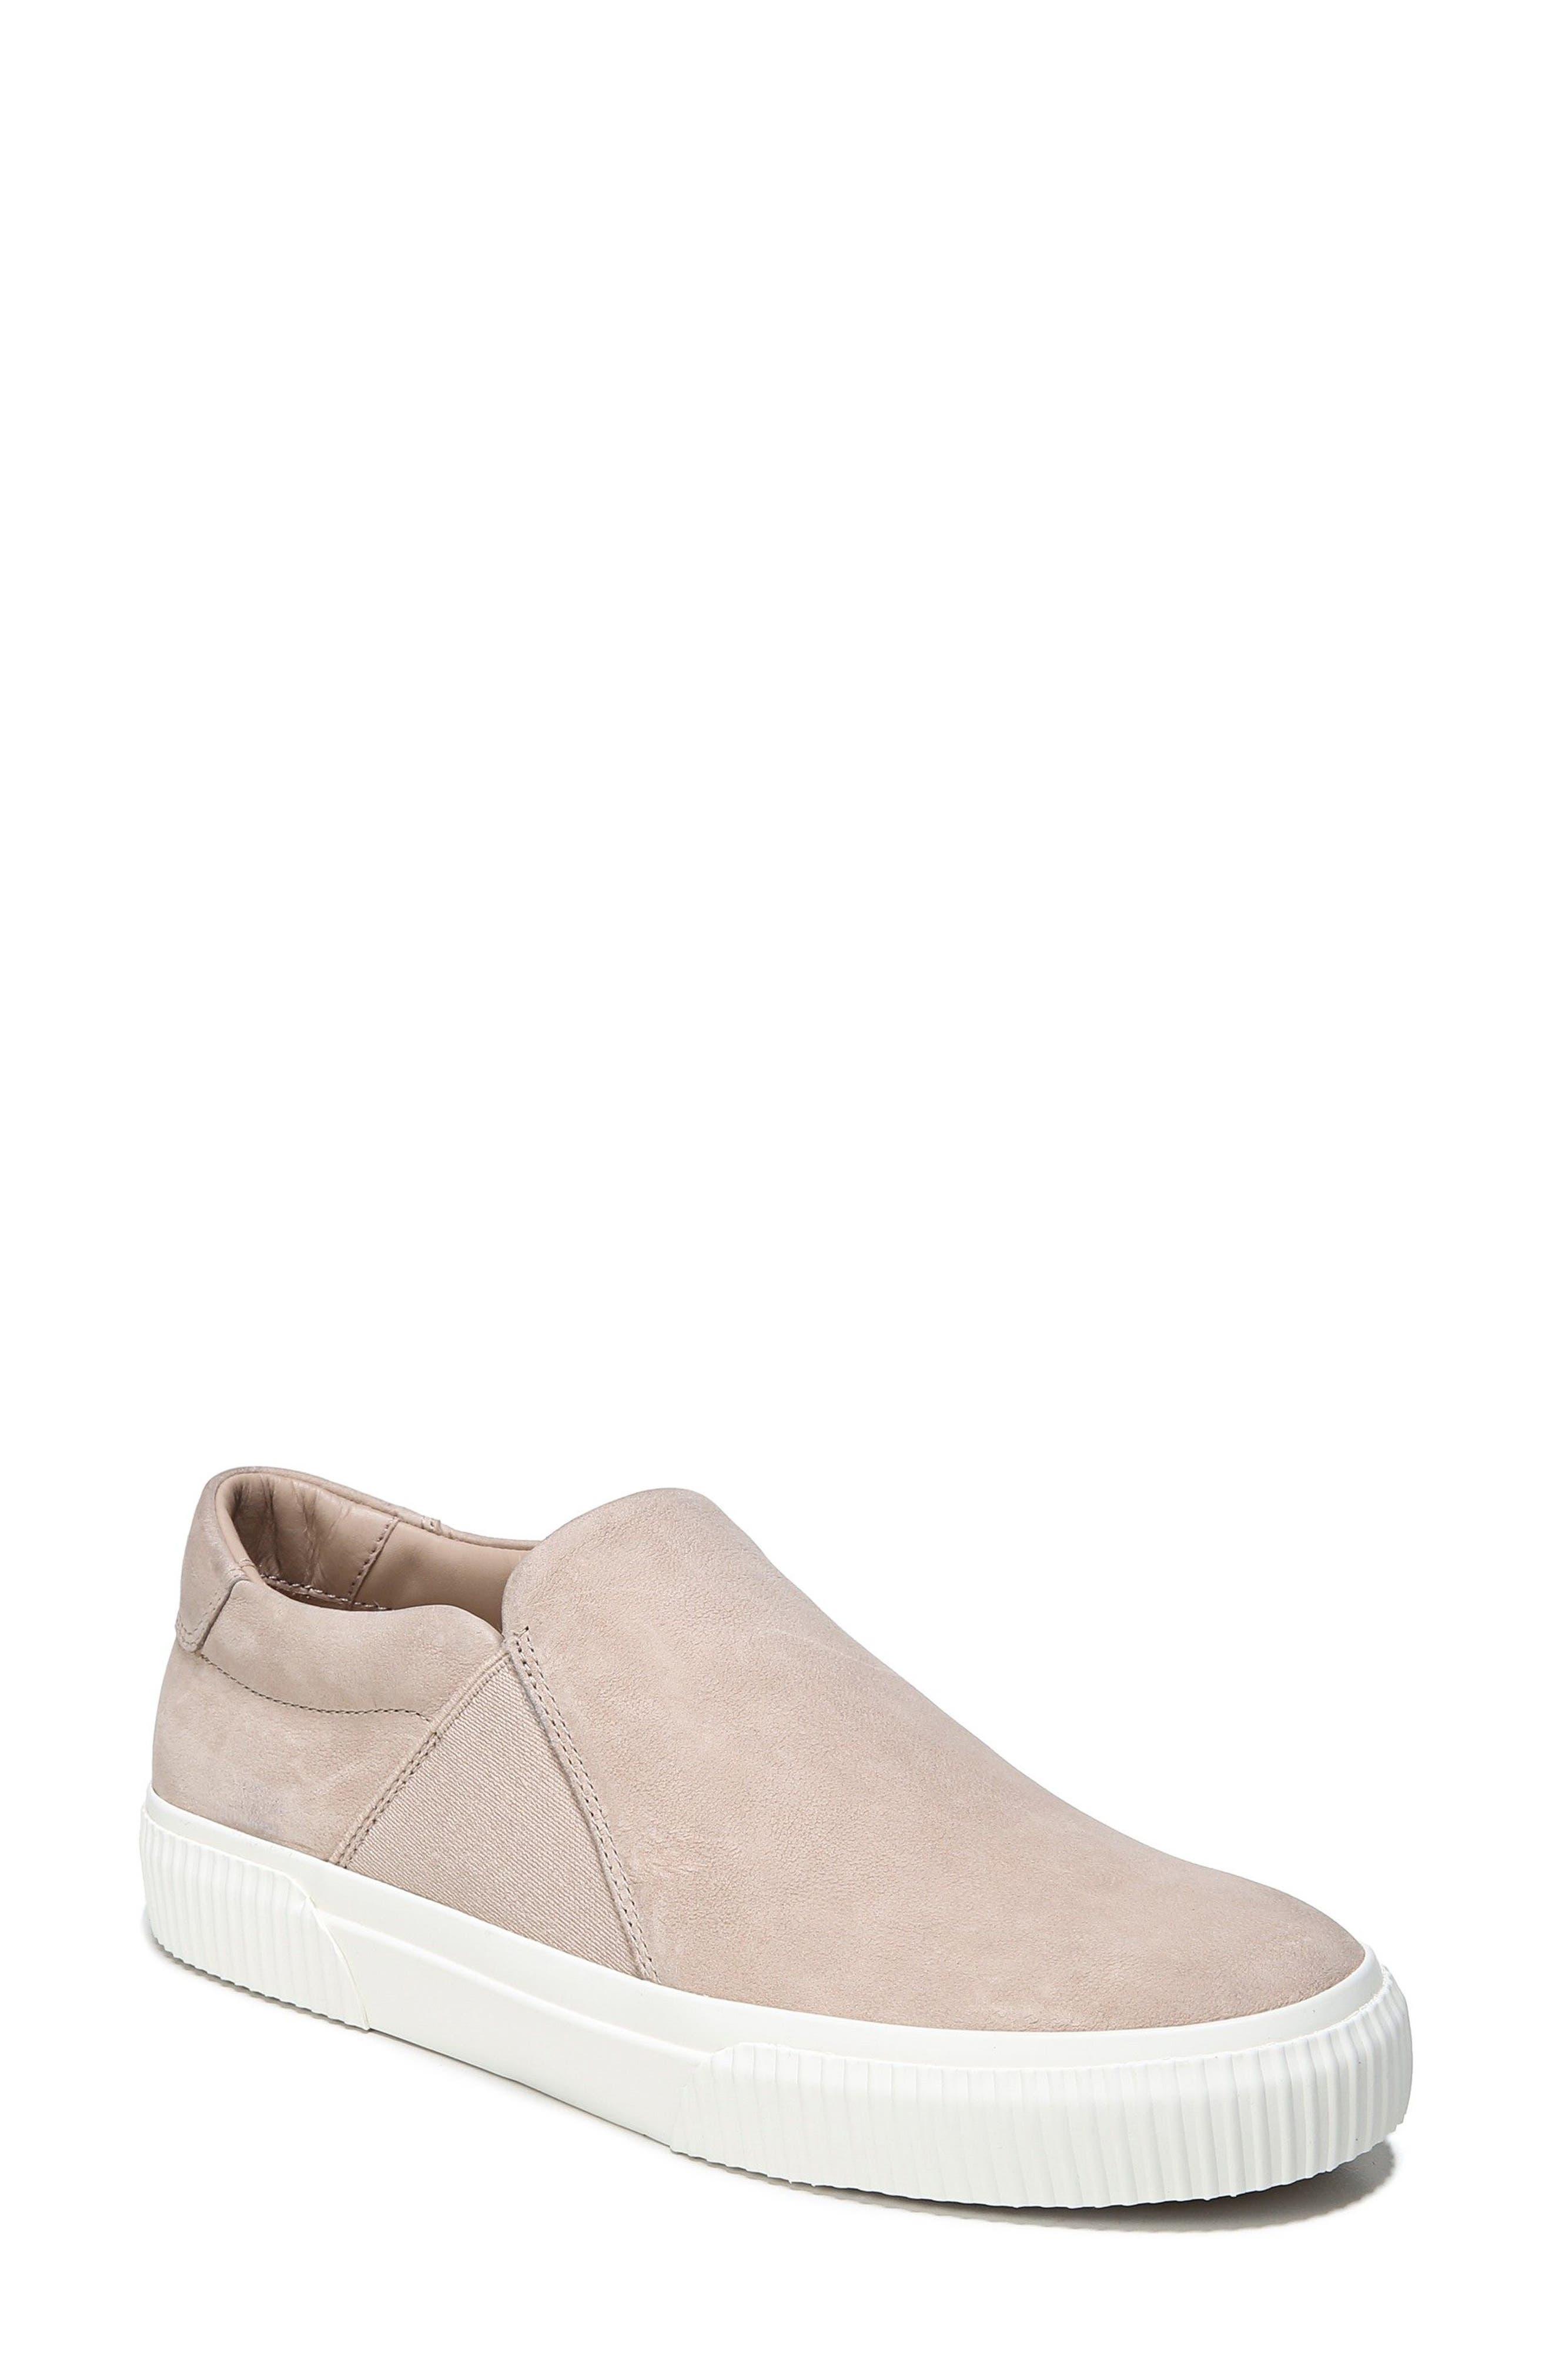 Alternate Image 1 Selected - Vince Knox Slip-On Sneaker (Women)